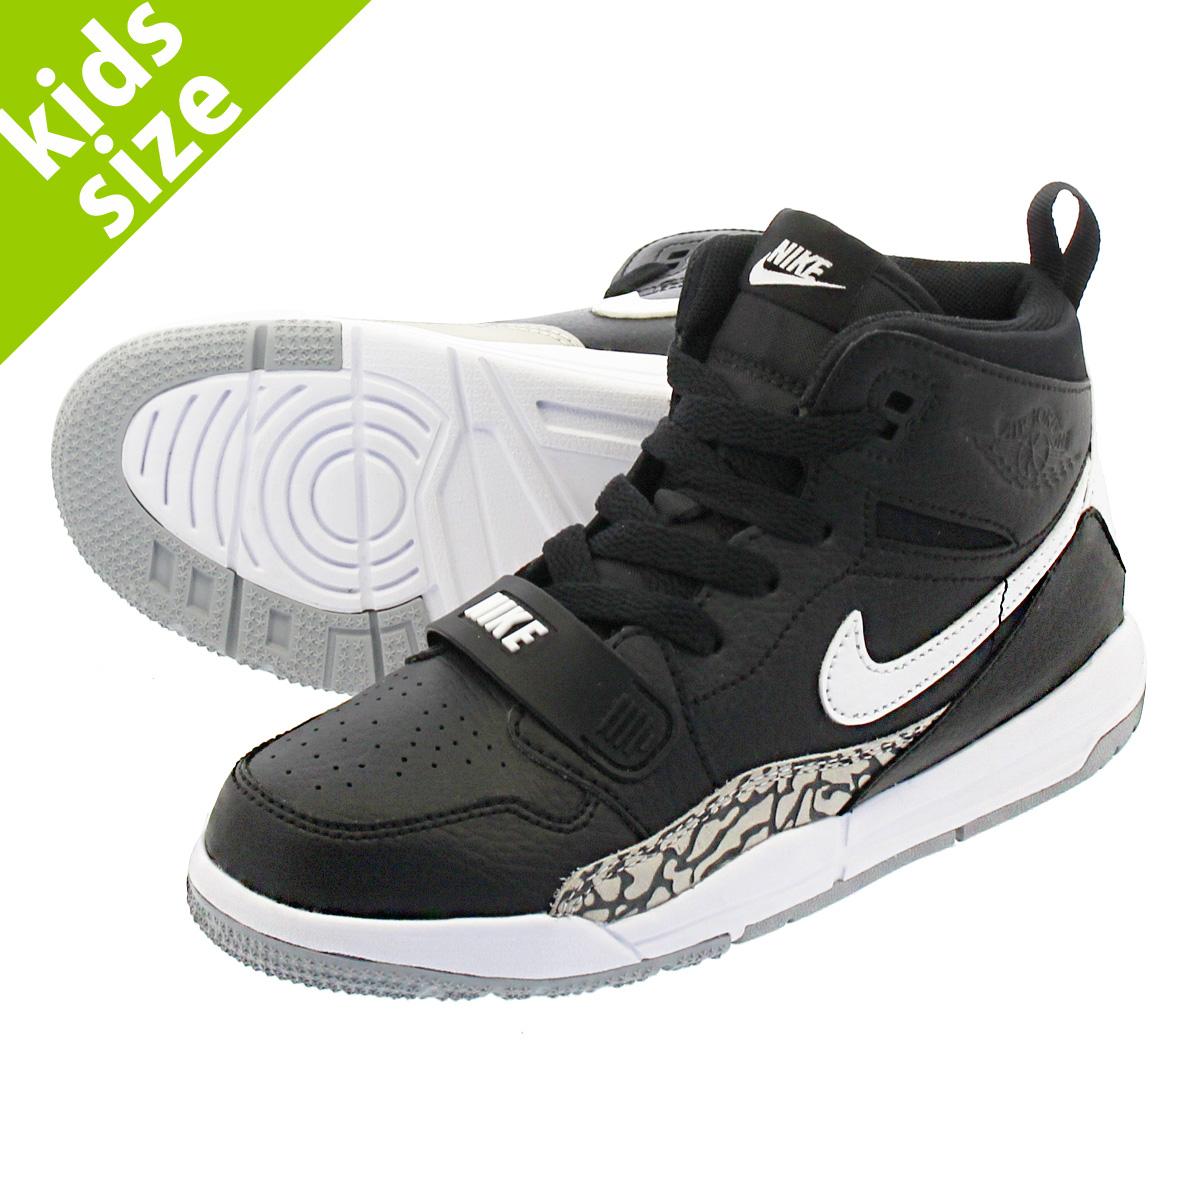 finest selection 3c4f2 f8982 NIKE AIR JORDAN LEGACY 312 PS Nike Air Jordan Legacy 312 PS BLACK/WHITE  at4047-001